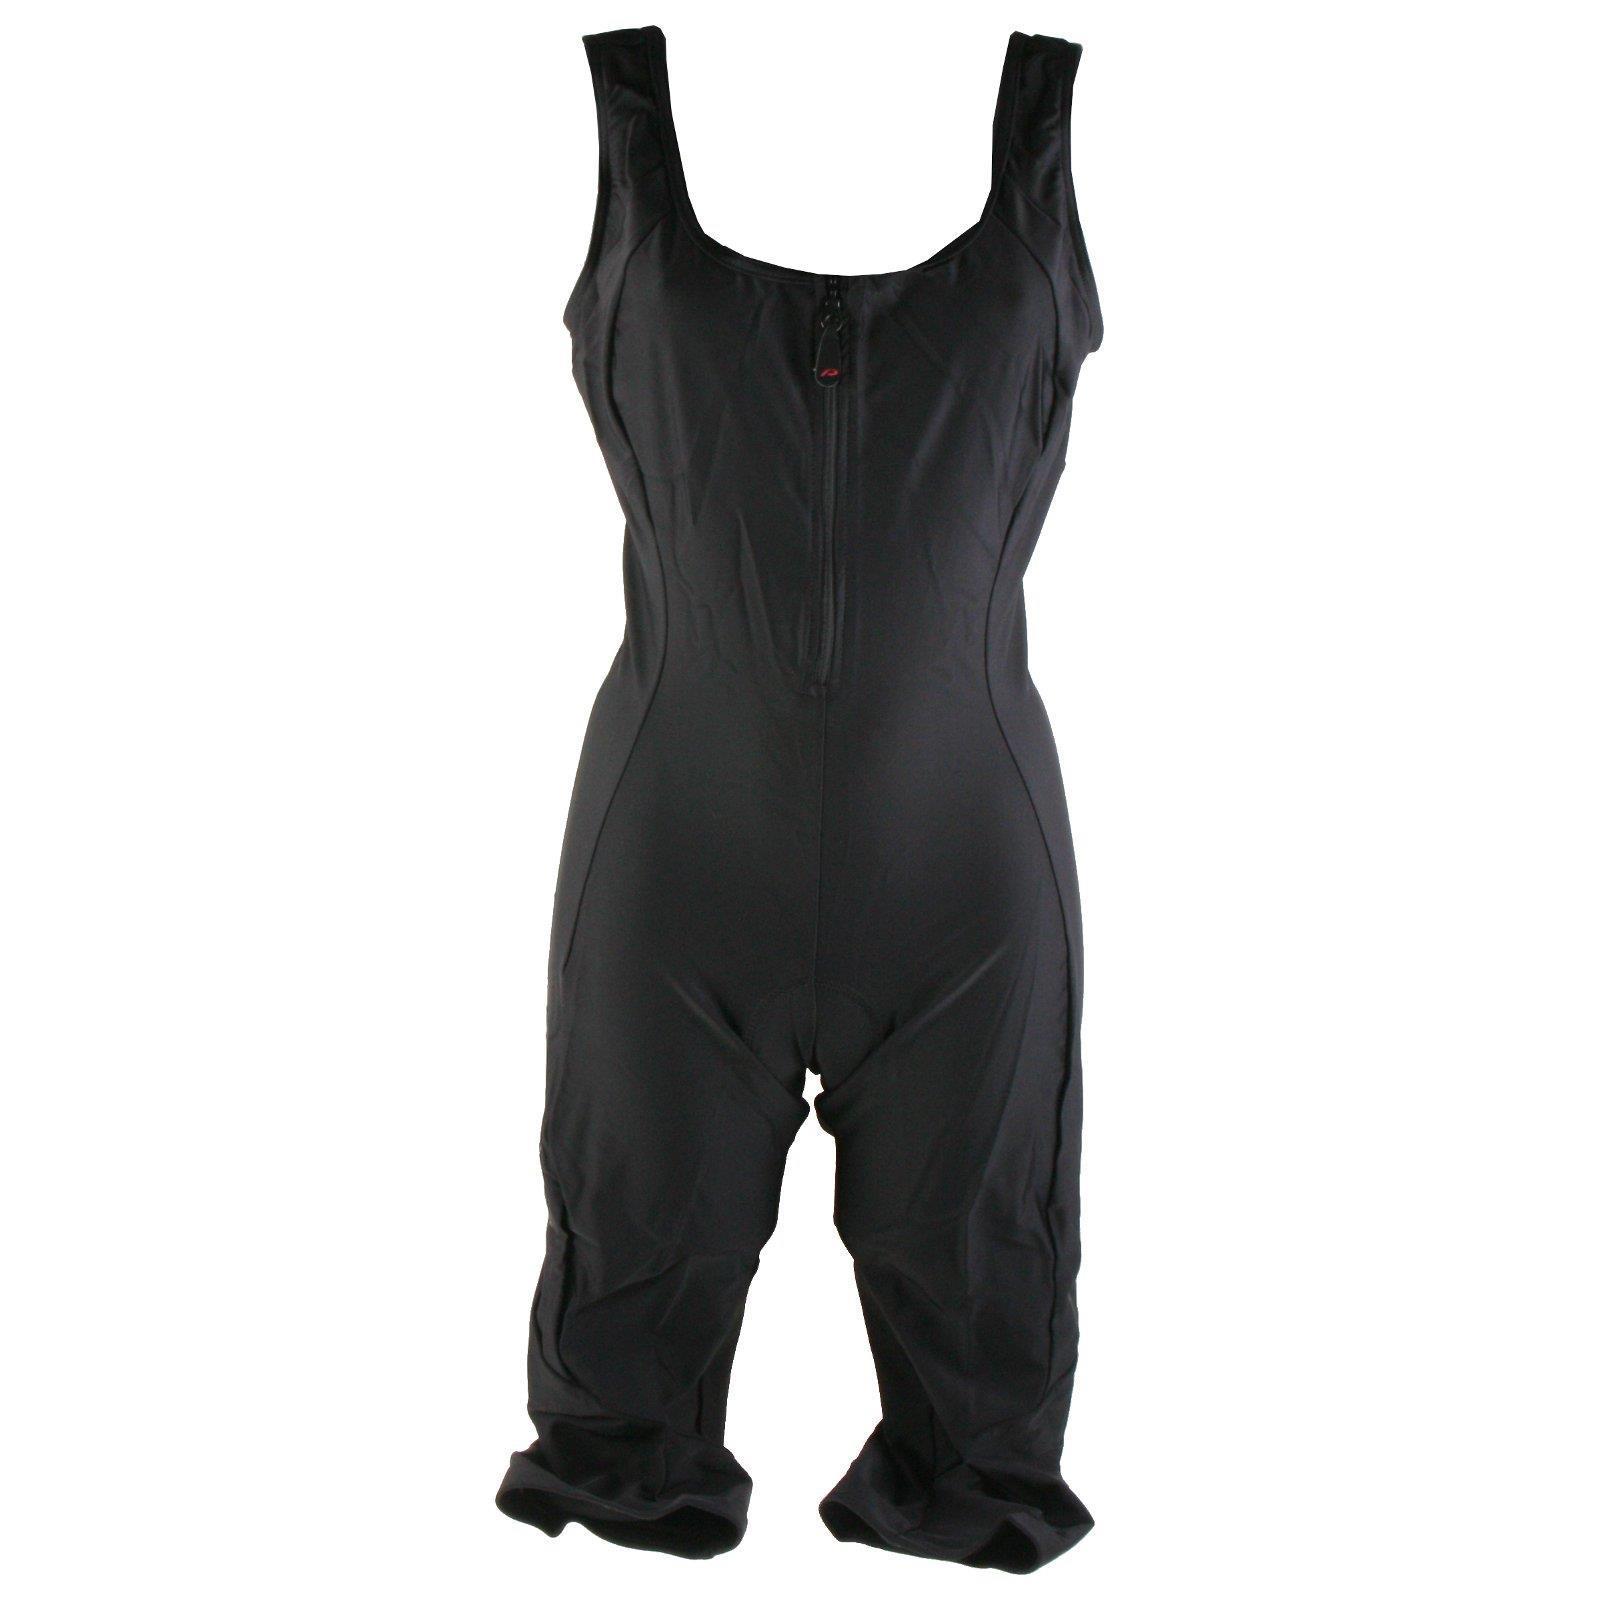 Protective-Taro-Long-Damen-Body-Suit-Sport-Trikot-Fahrrad-Running-Training-Lauf